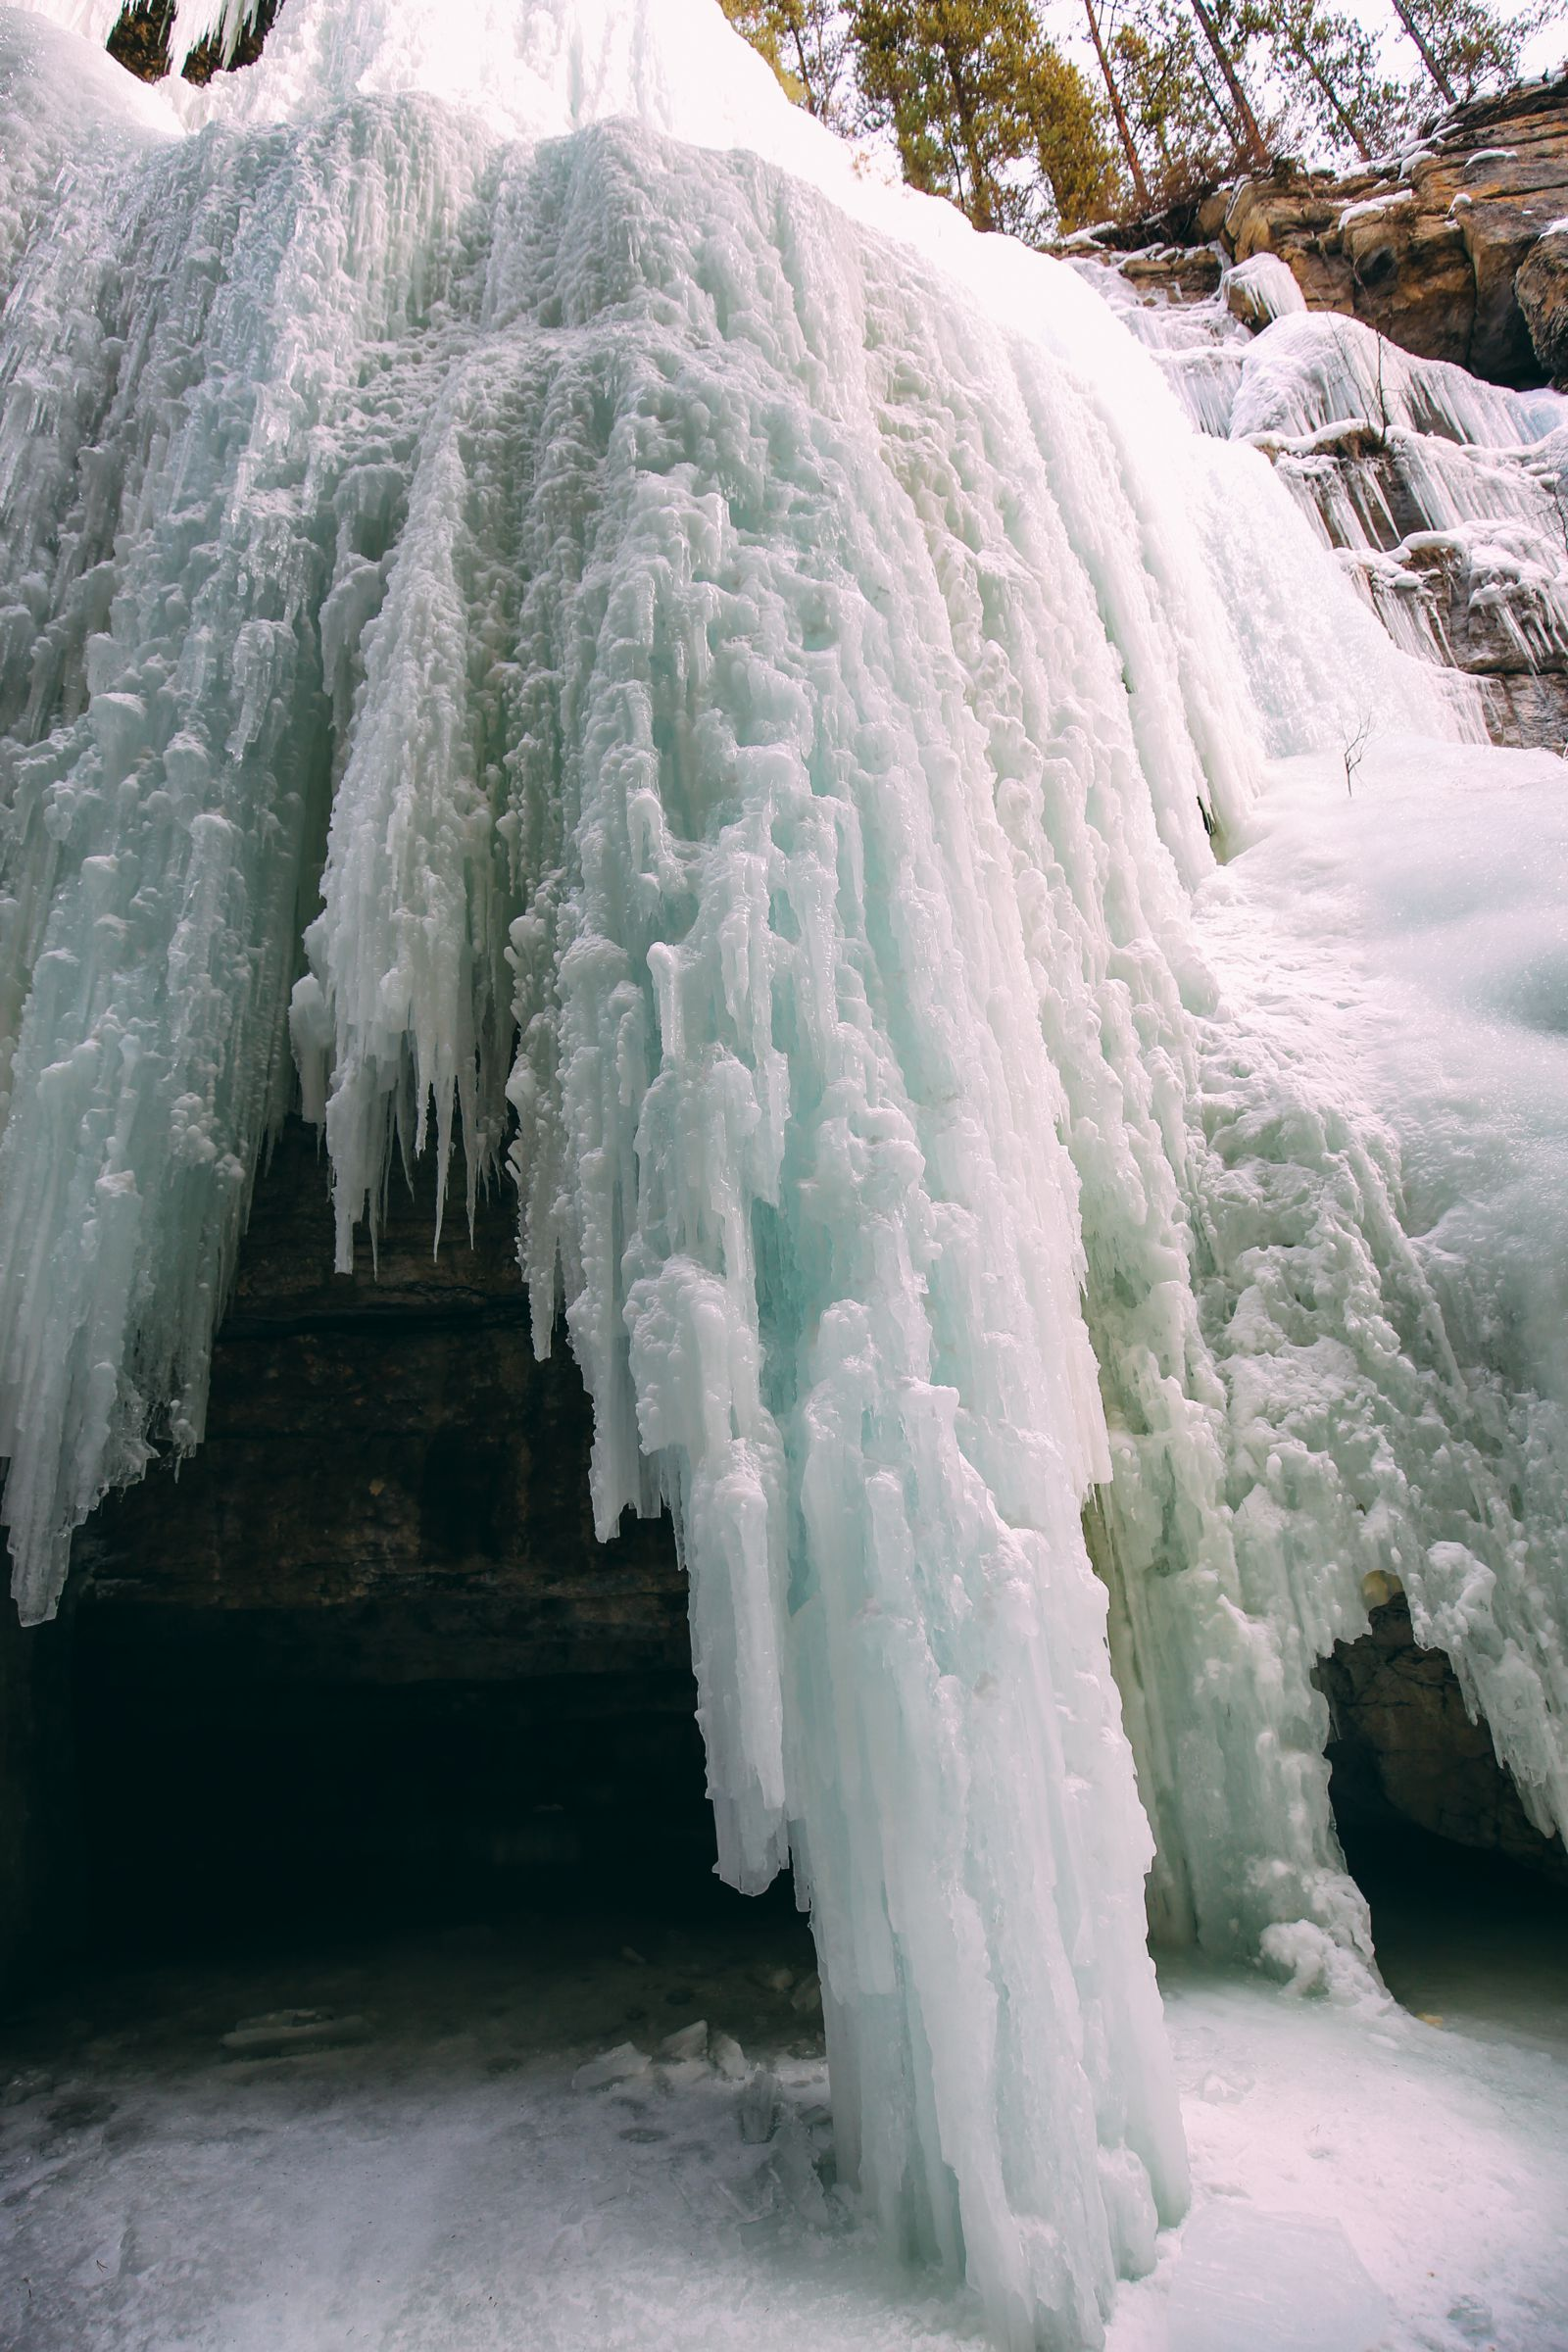 The Most Beautiful Place In Jasper (Canada) You've Never Heard Of! (38)